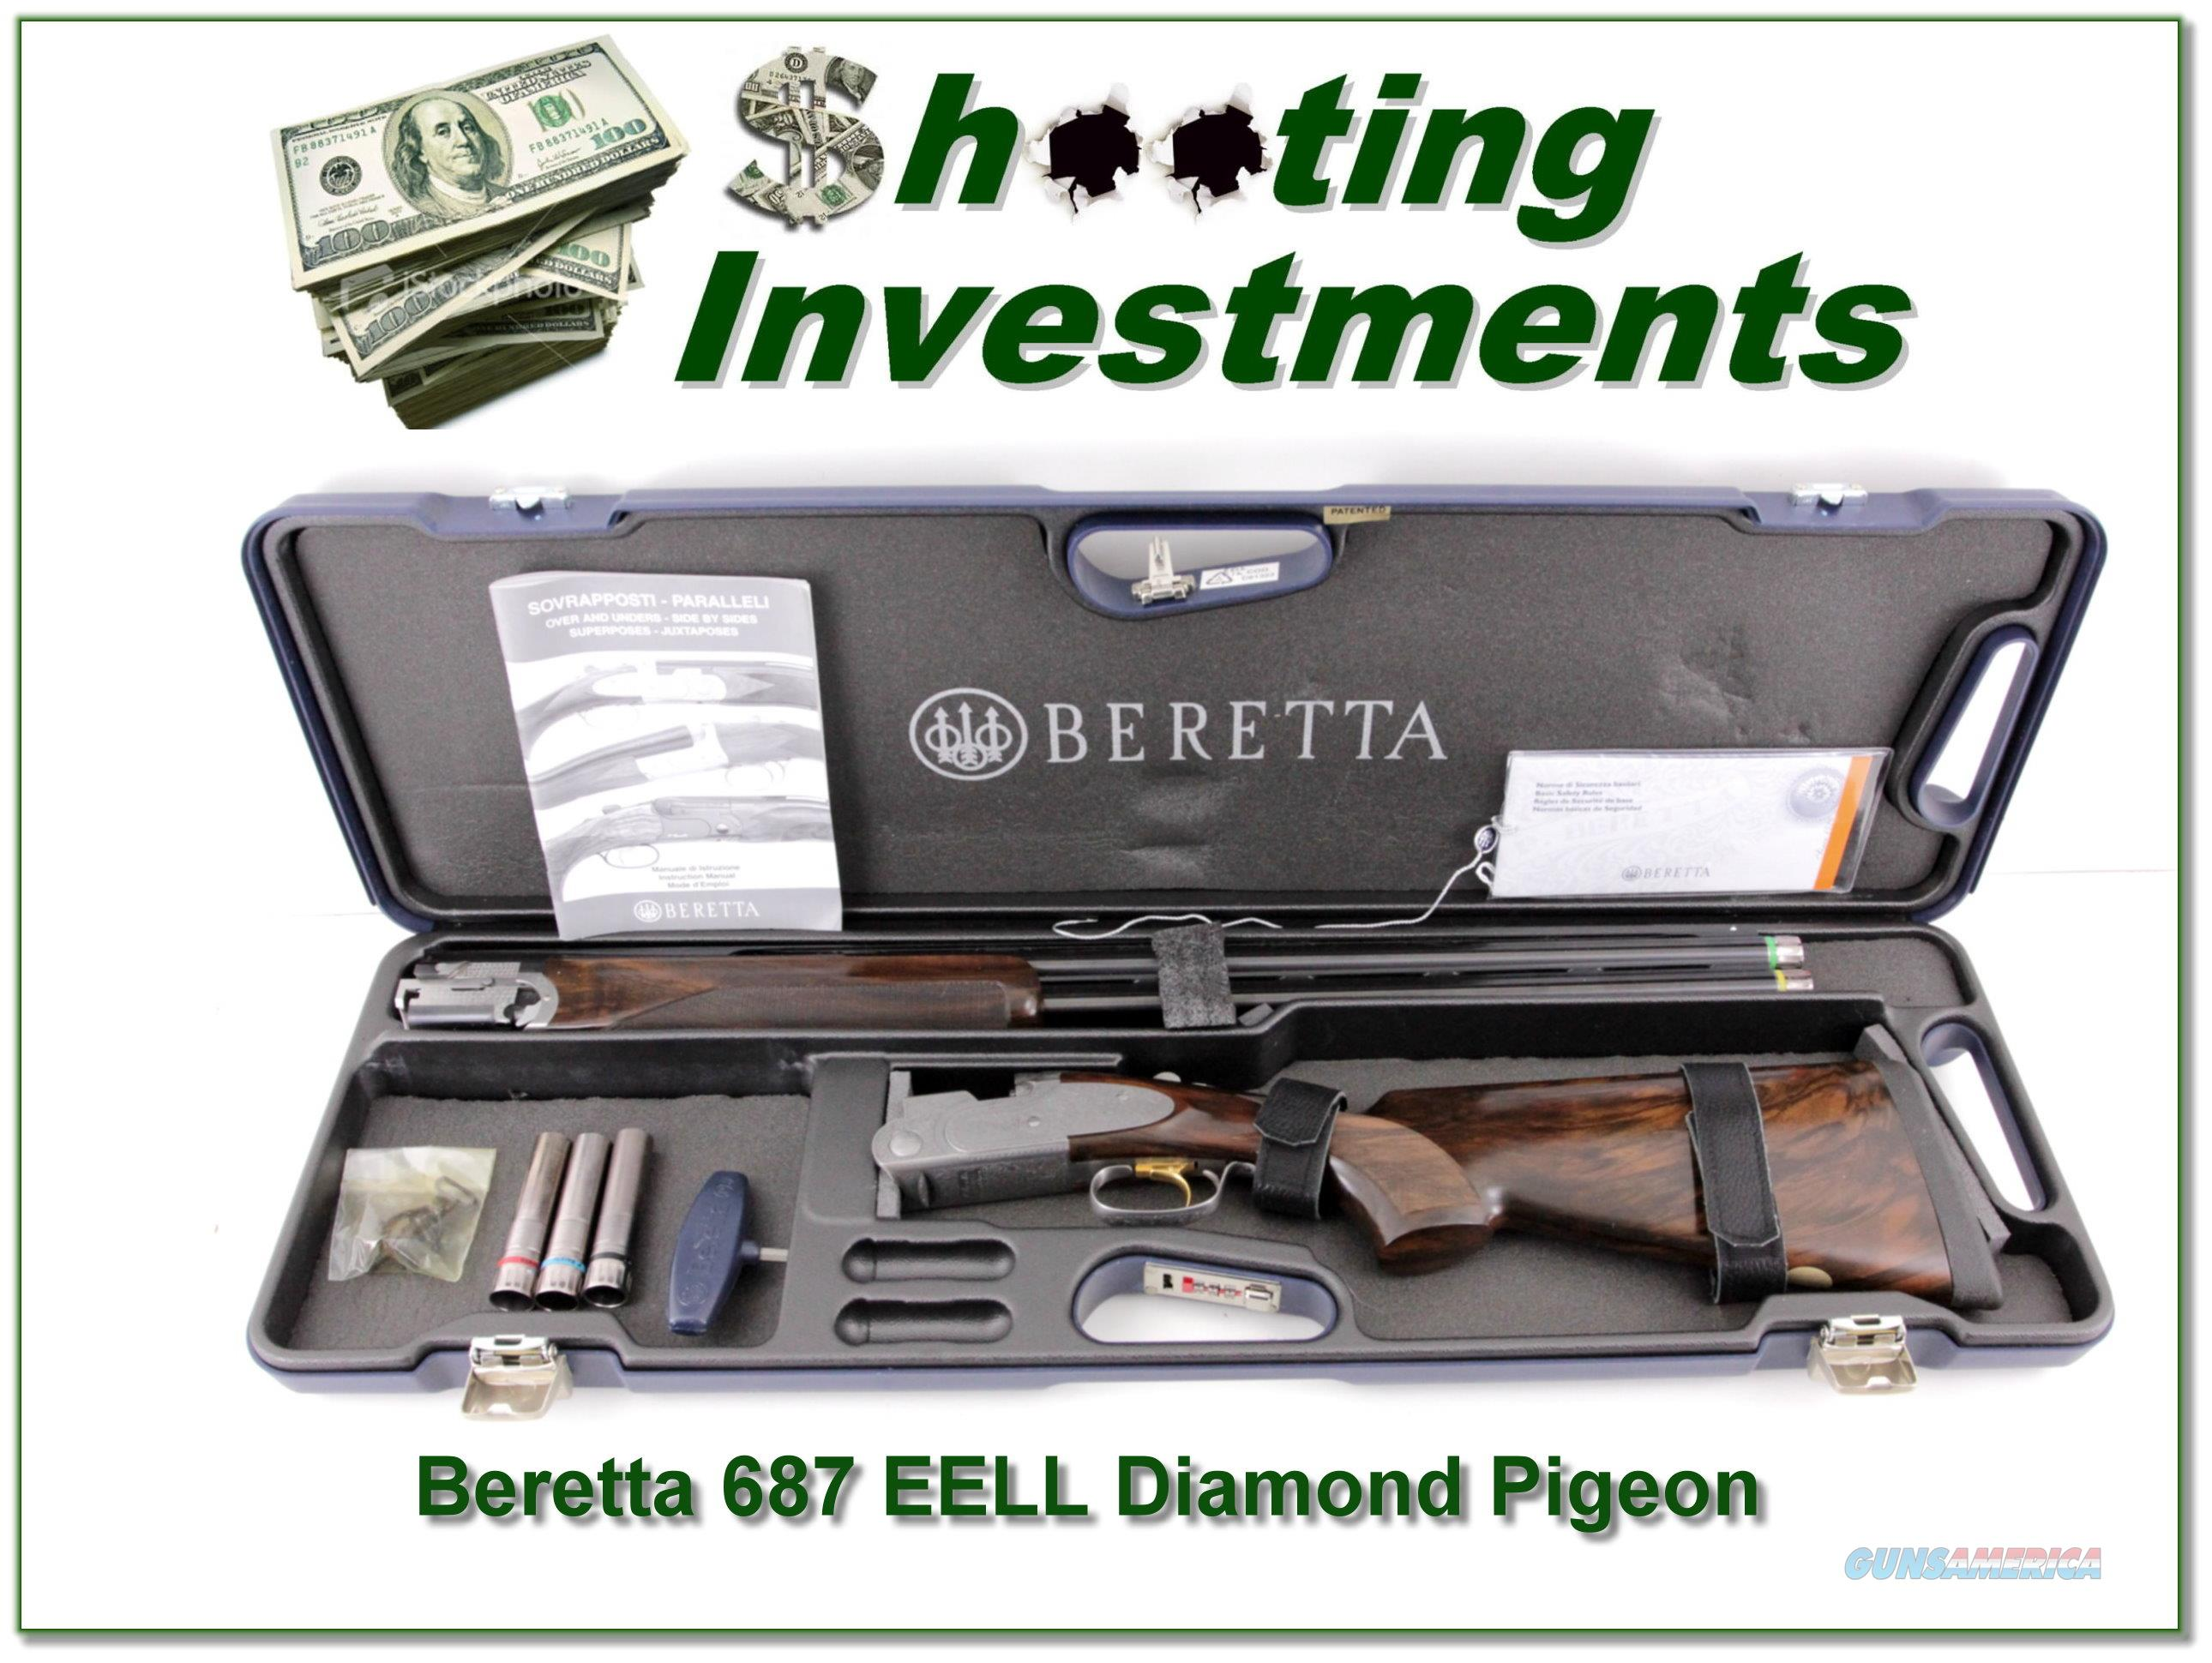 Beretta S 687 EELL Diamond Pigeon 12 Ga ANIC!  Guns > Shotguns > Beretta Shotguns > O/U > Hunting